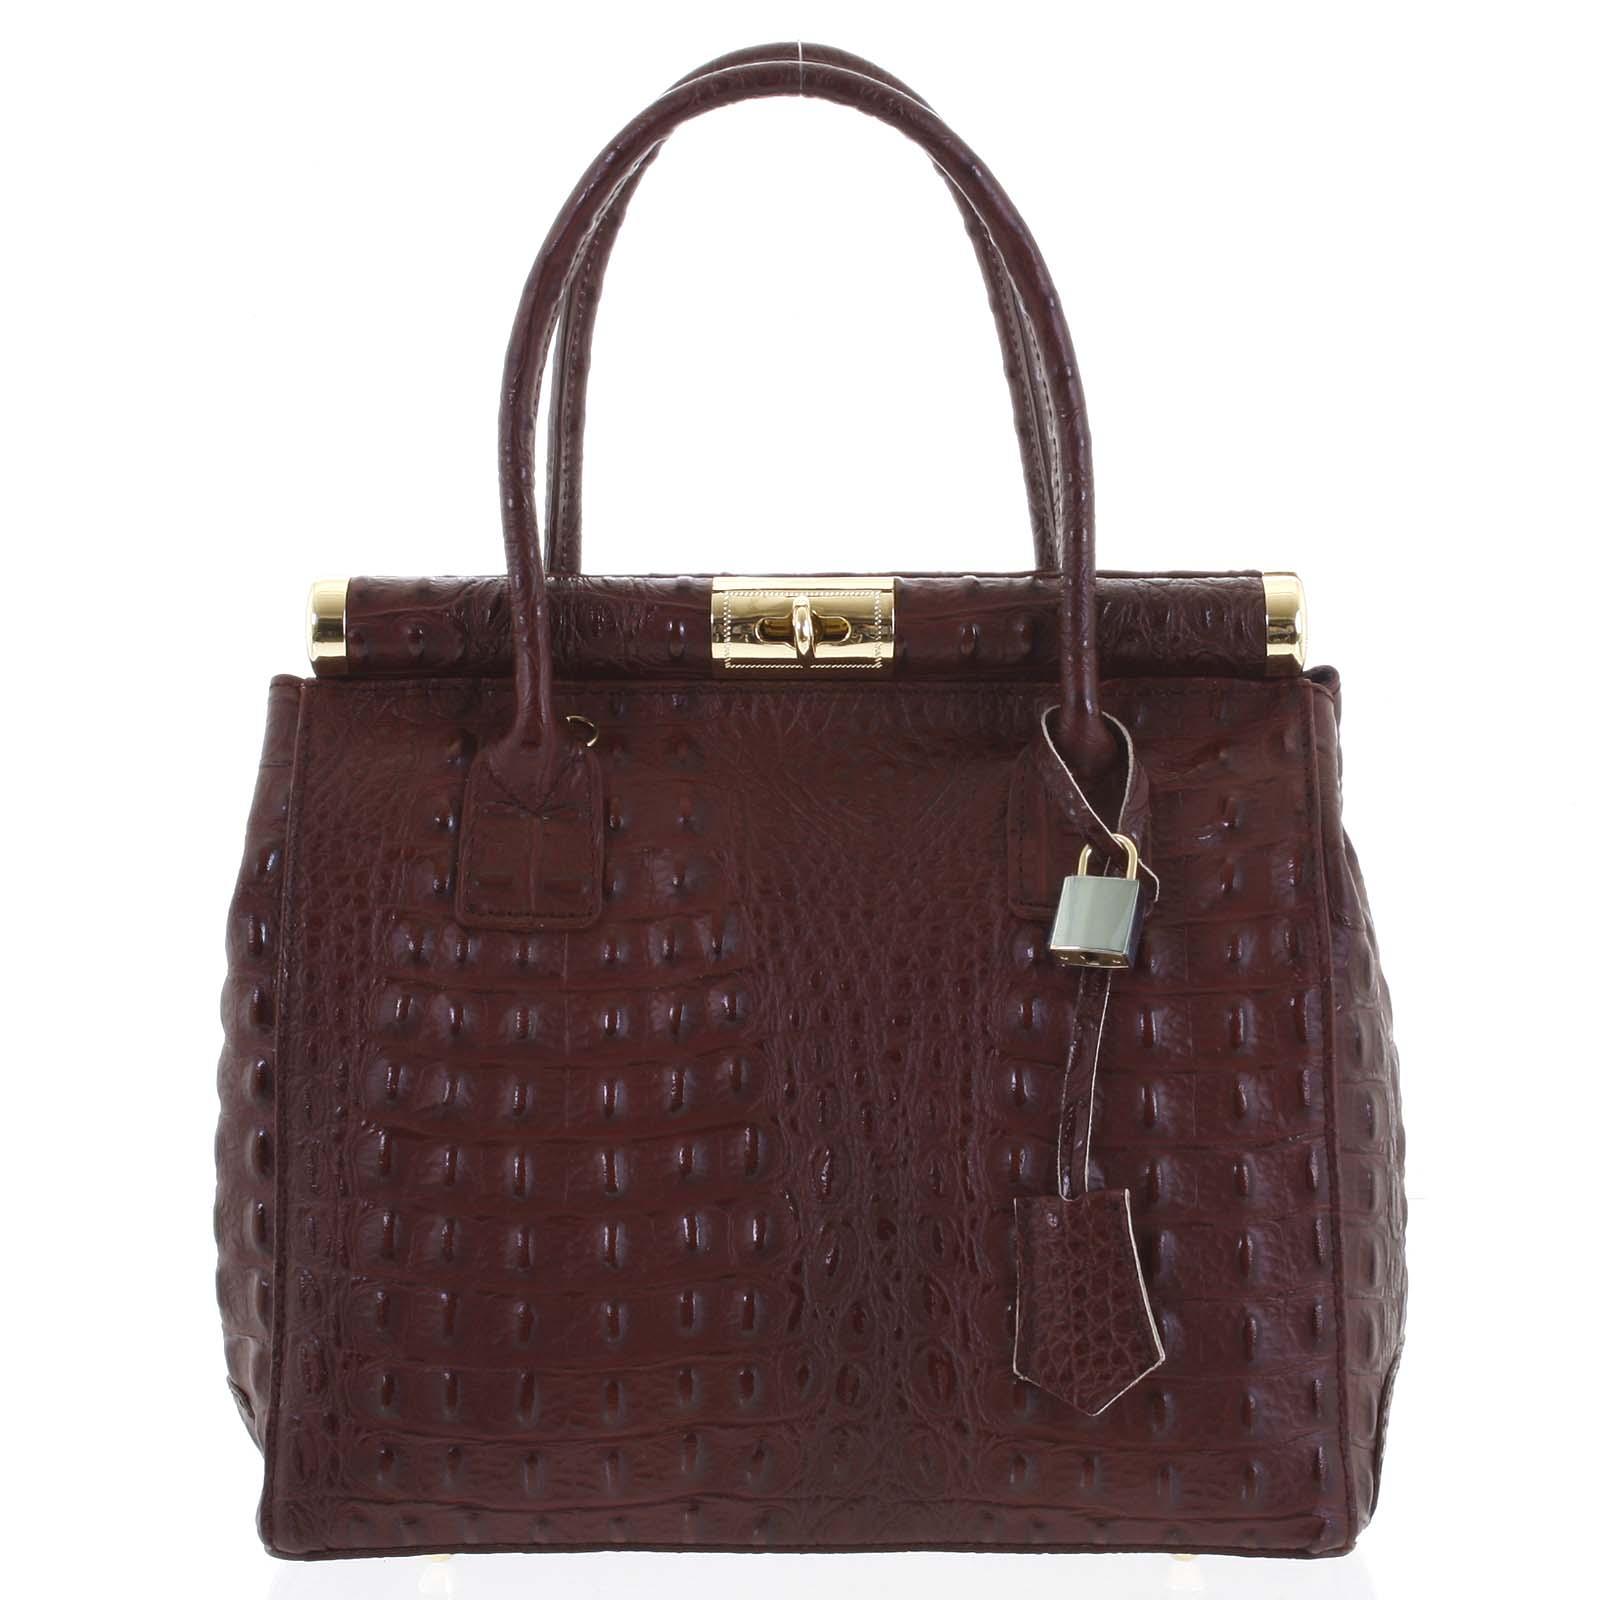 Luxusná dámska kožená kabelka do ruky bordová - ItalY Hyla Kroko vínová